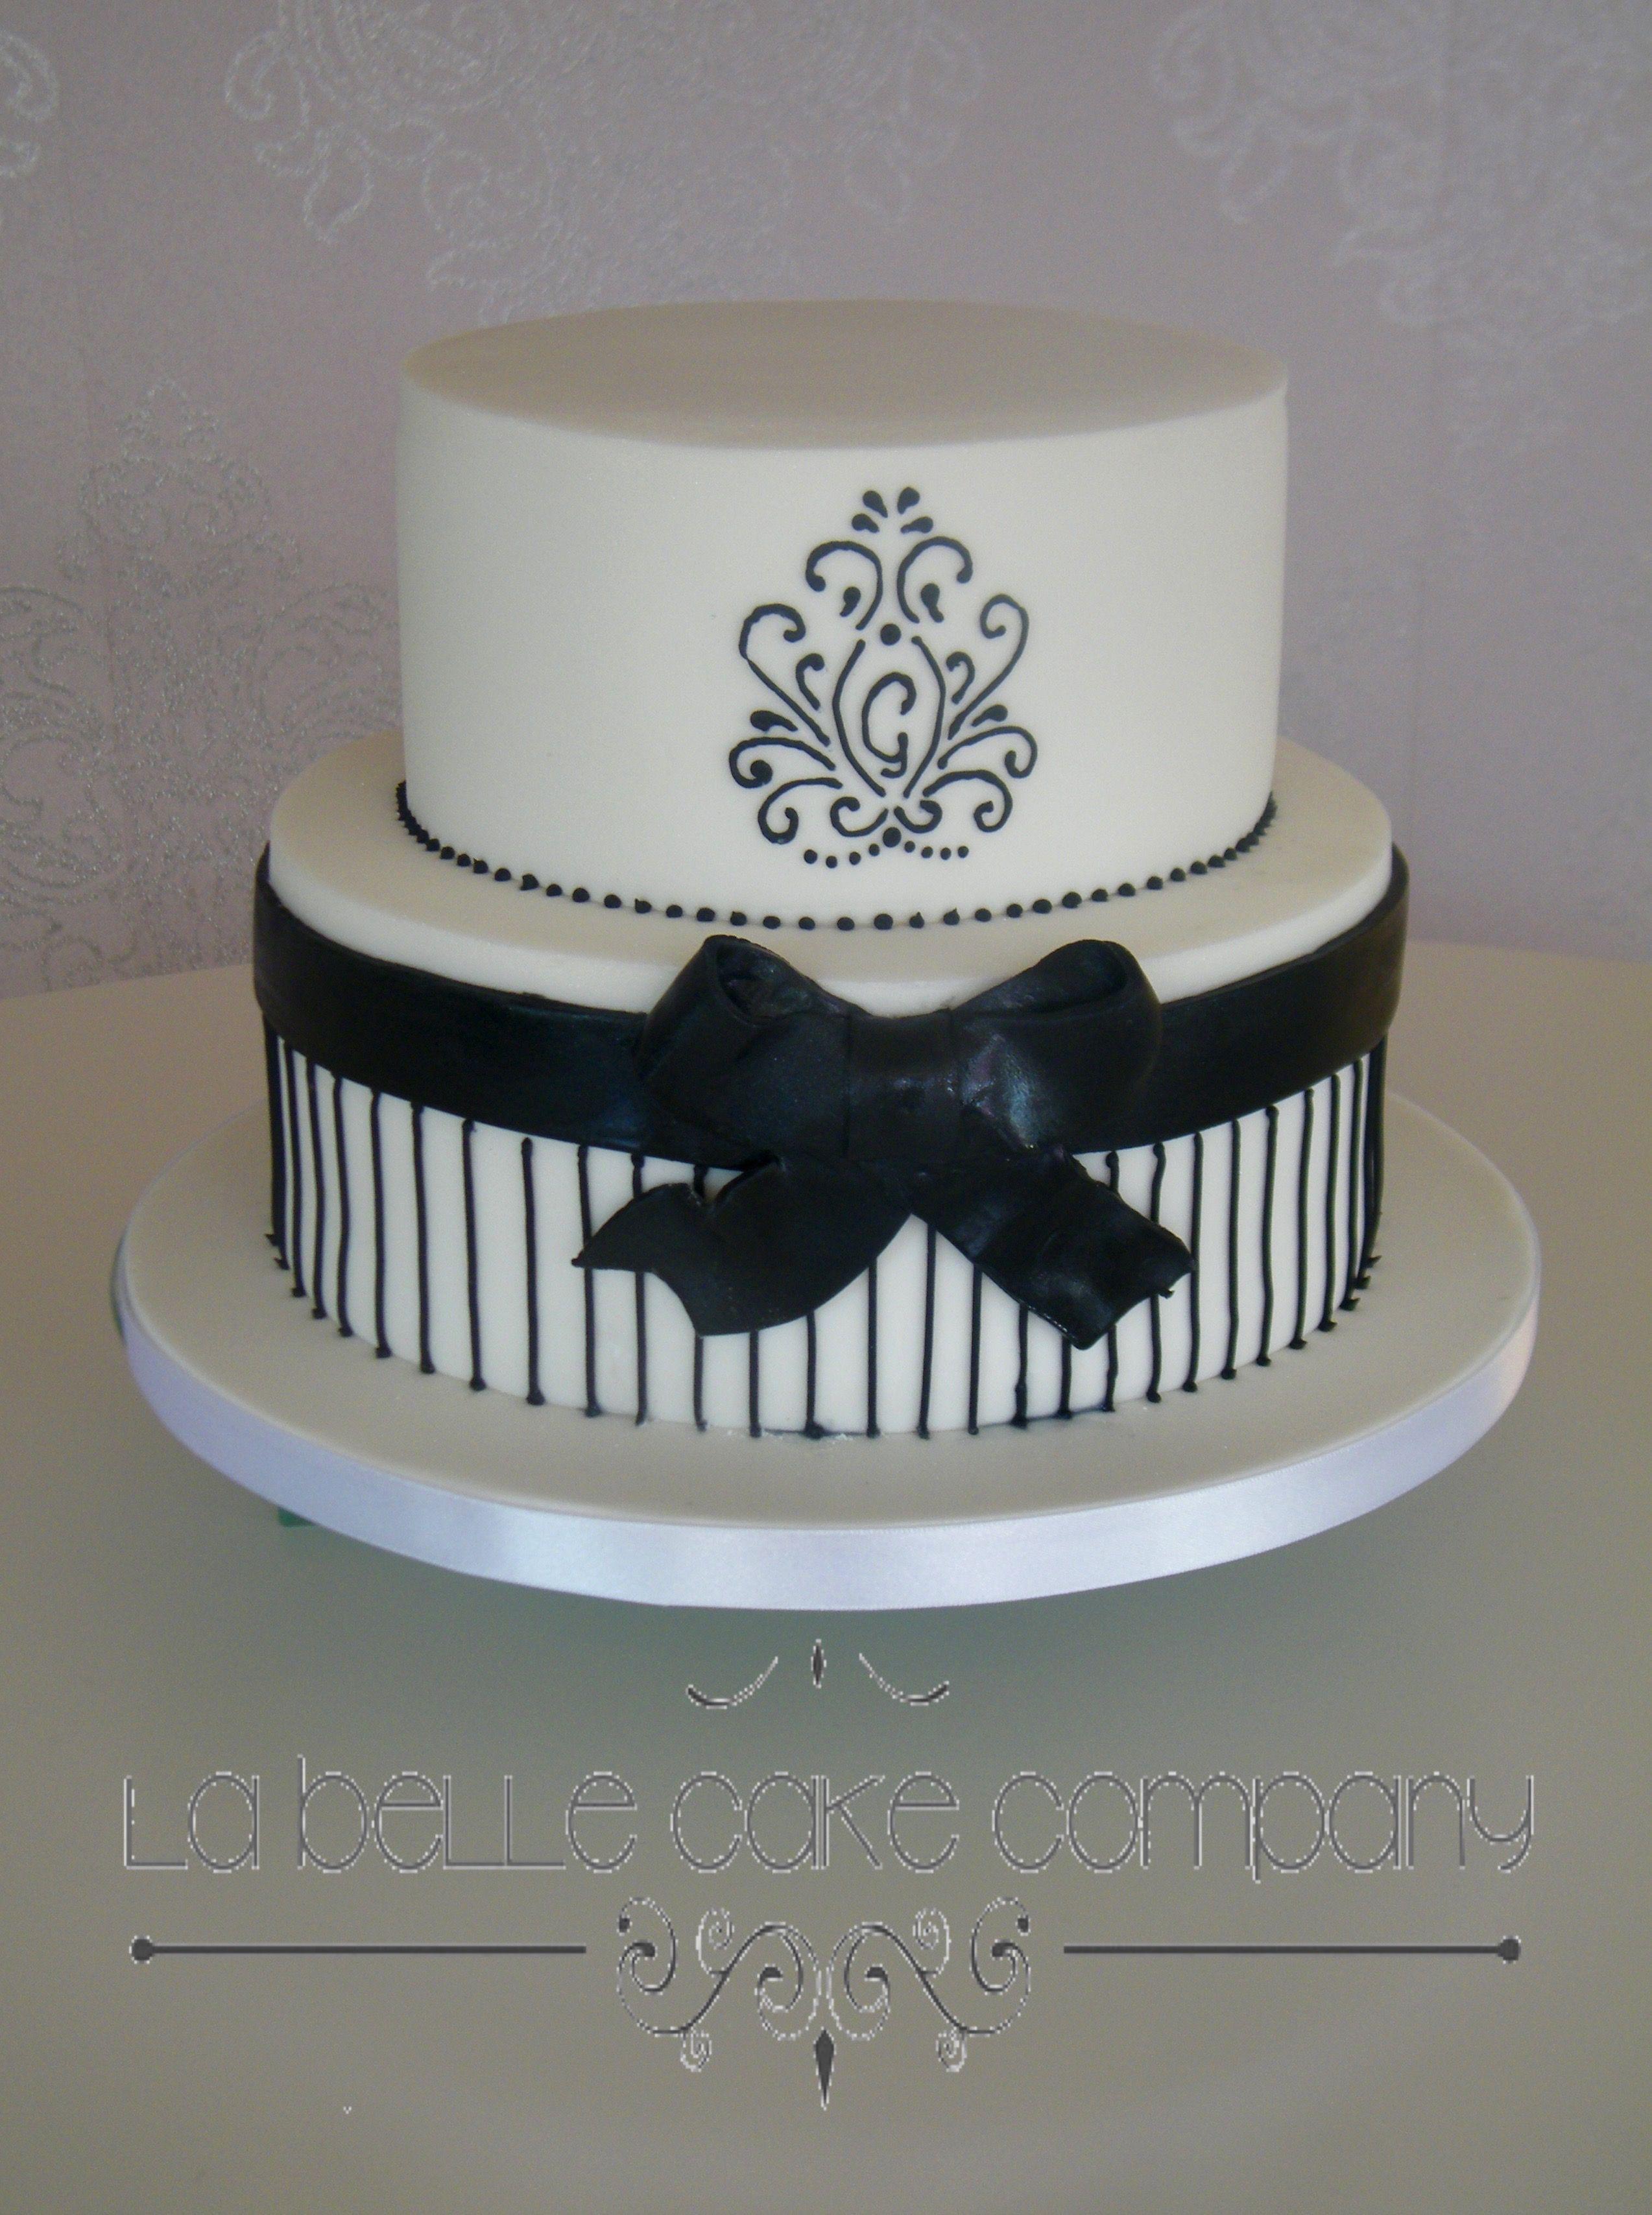 Black And White Monochrome Birthday Celebration Cake By La Belle